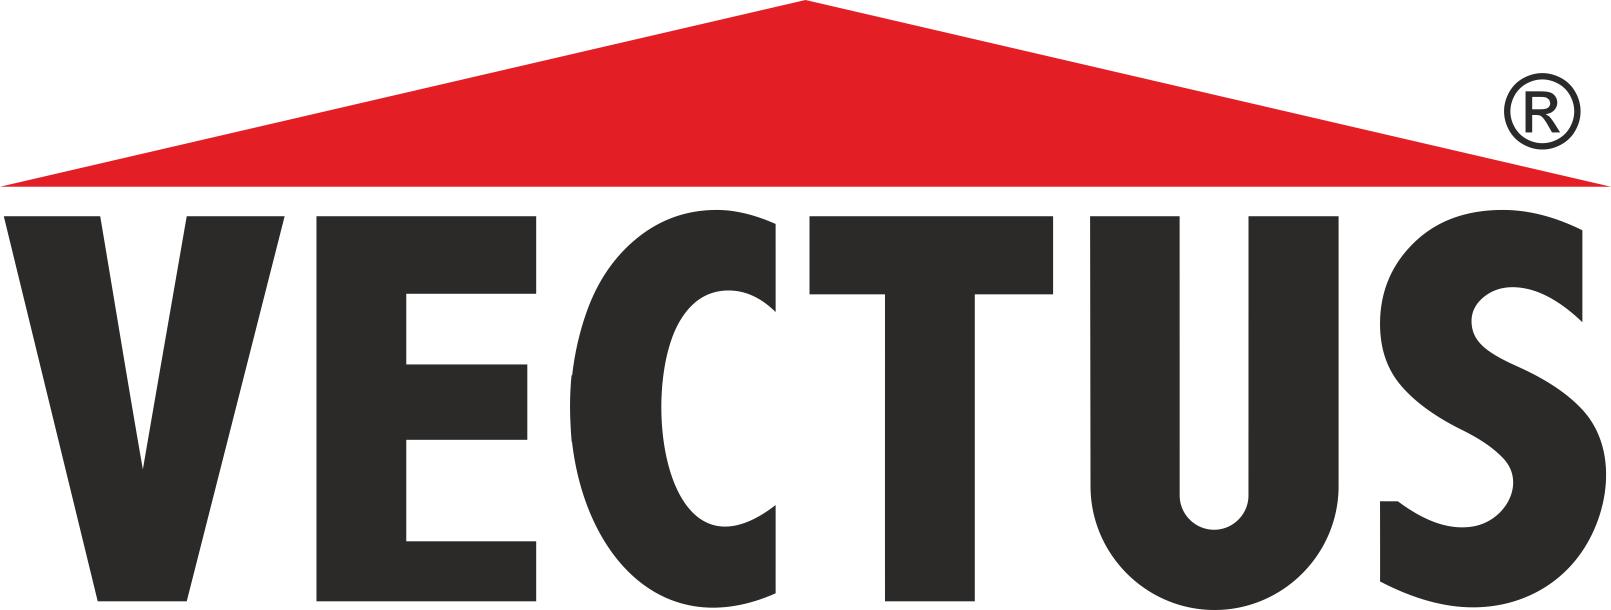 Vectus Logo